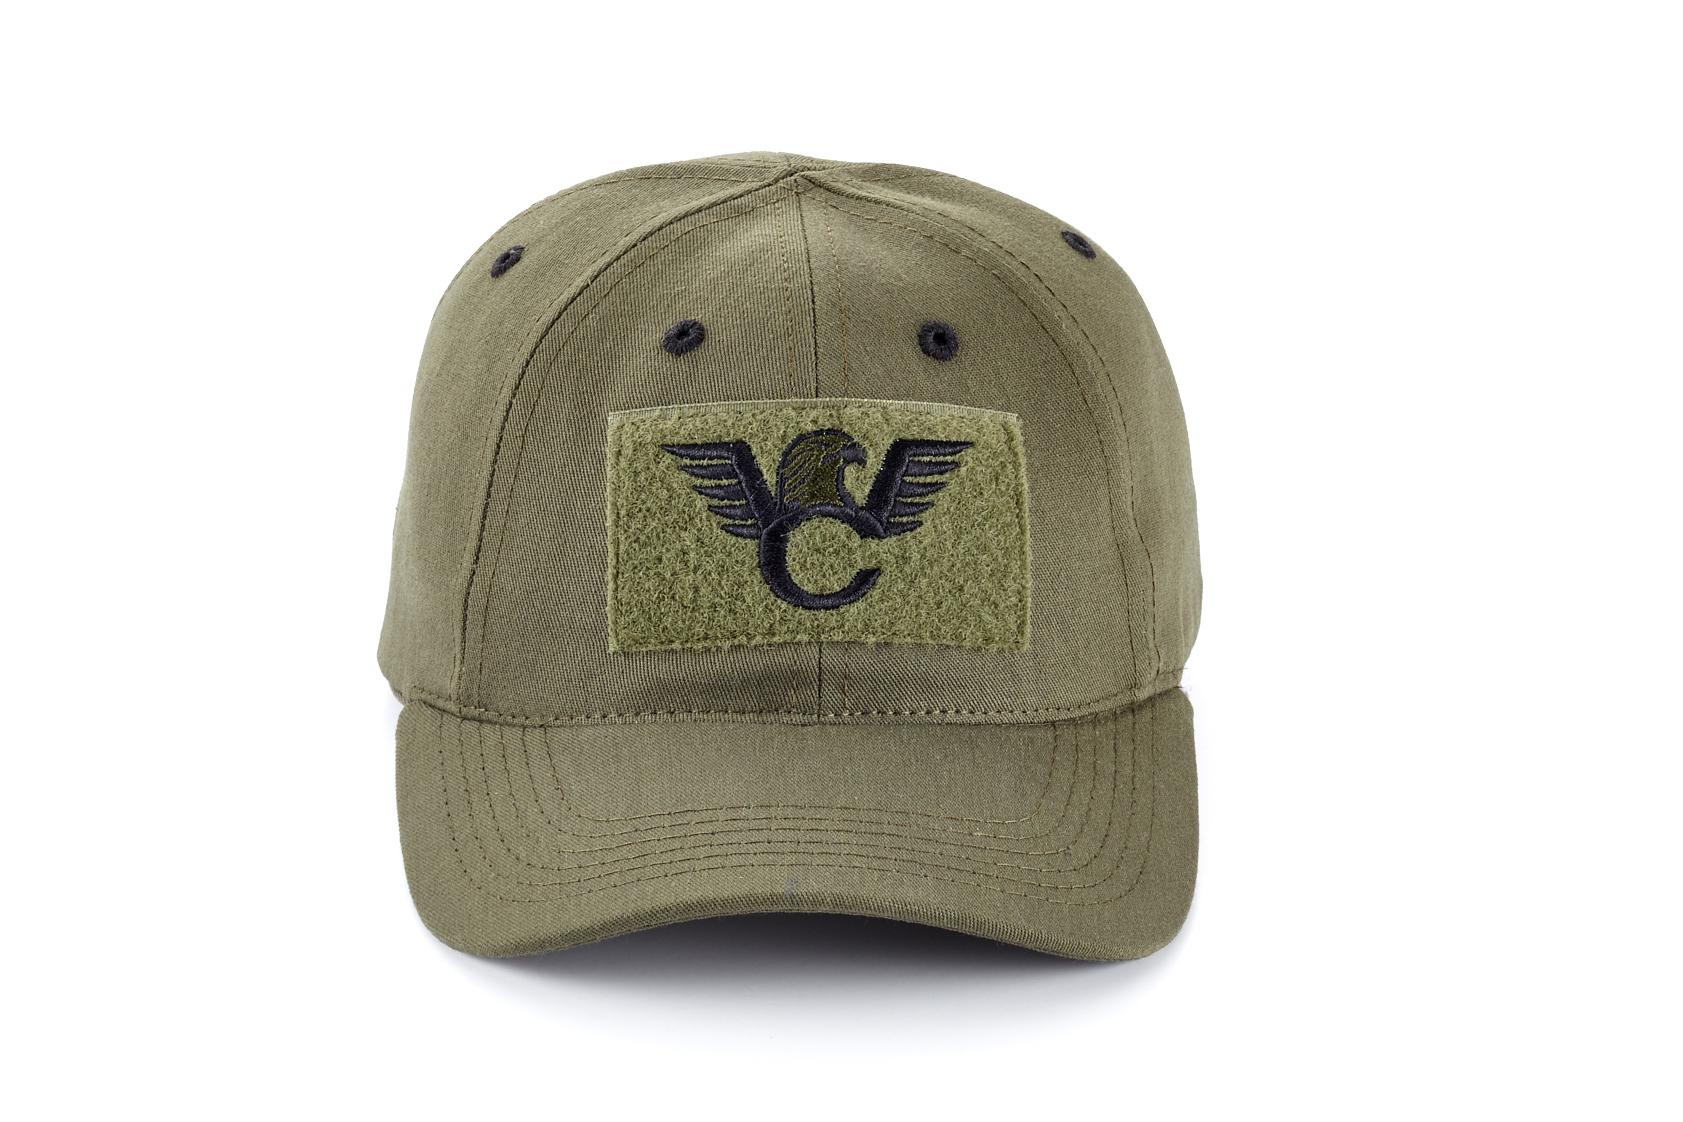 Headwear-https   shopwilsoncombat.com  9966a05186e